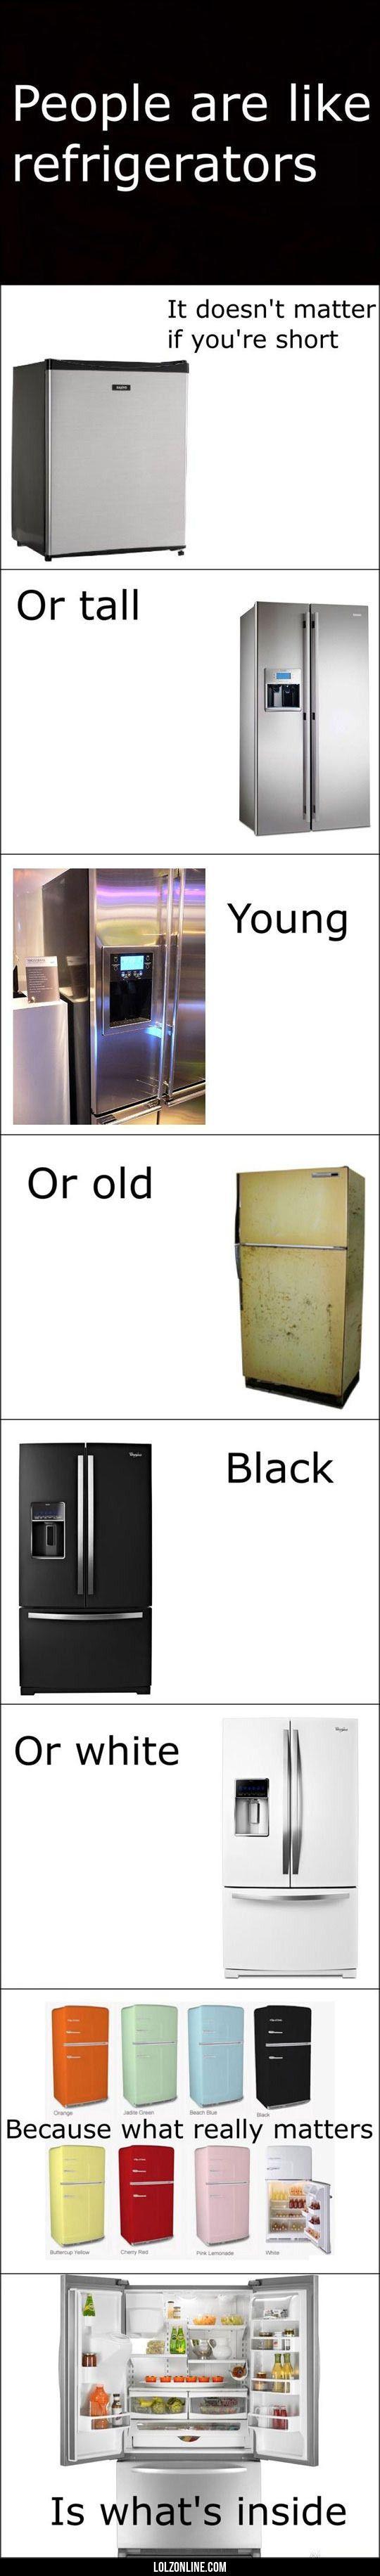 People Are Just Like Refrigerators#funny #lol #lolzonline